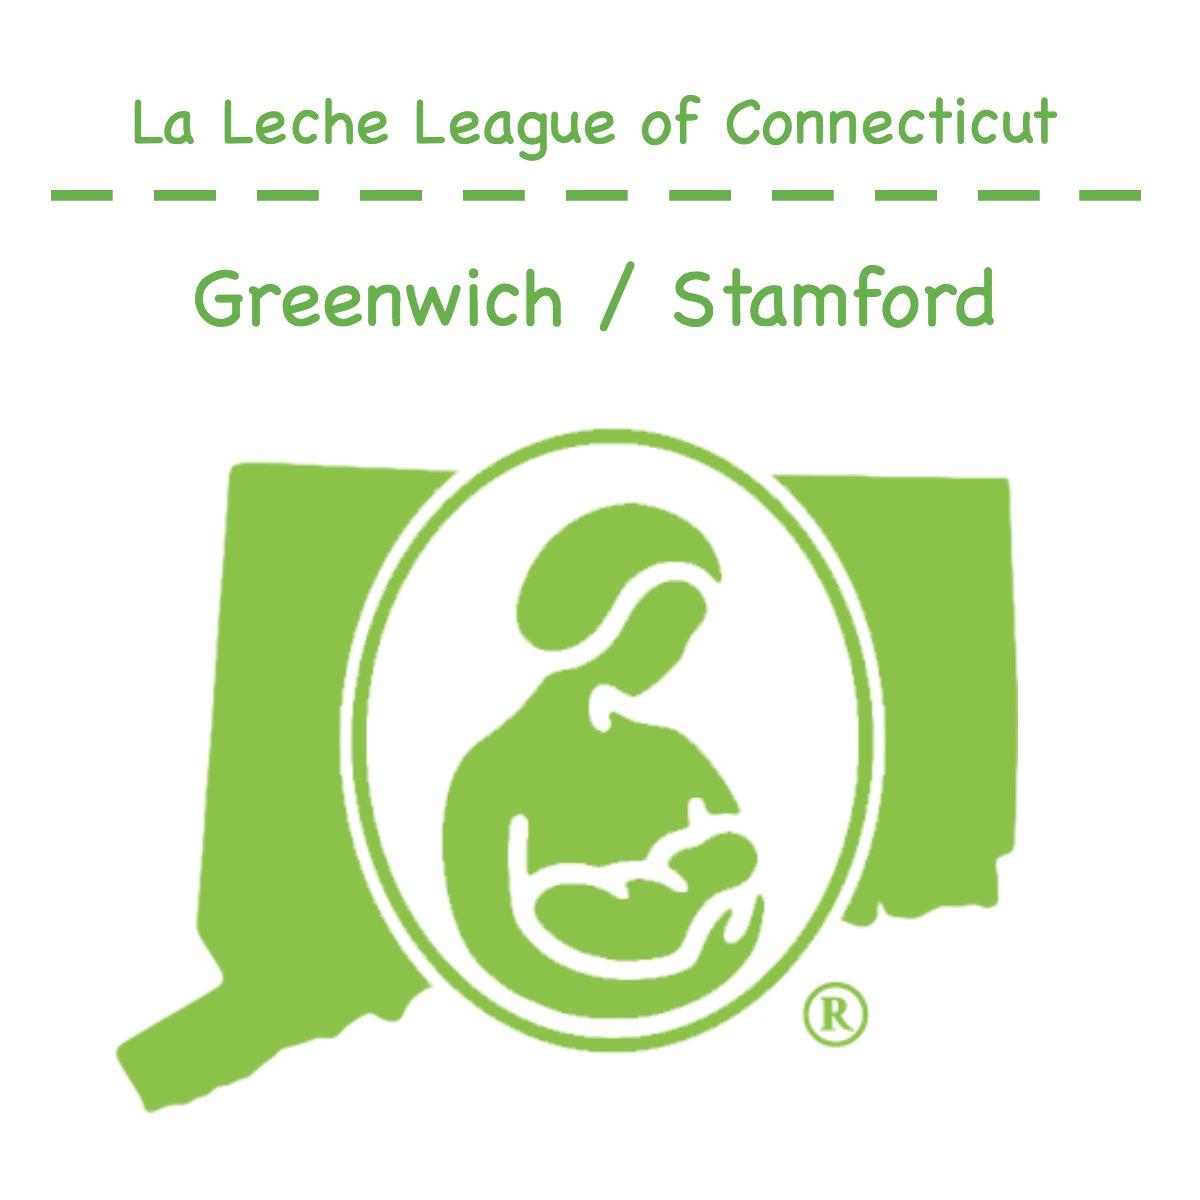 LLLCT greenwich logo_AUkz.jpg